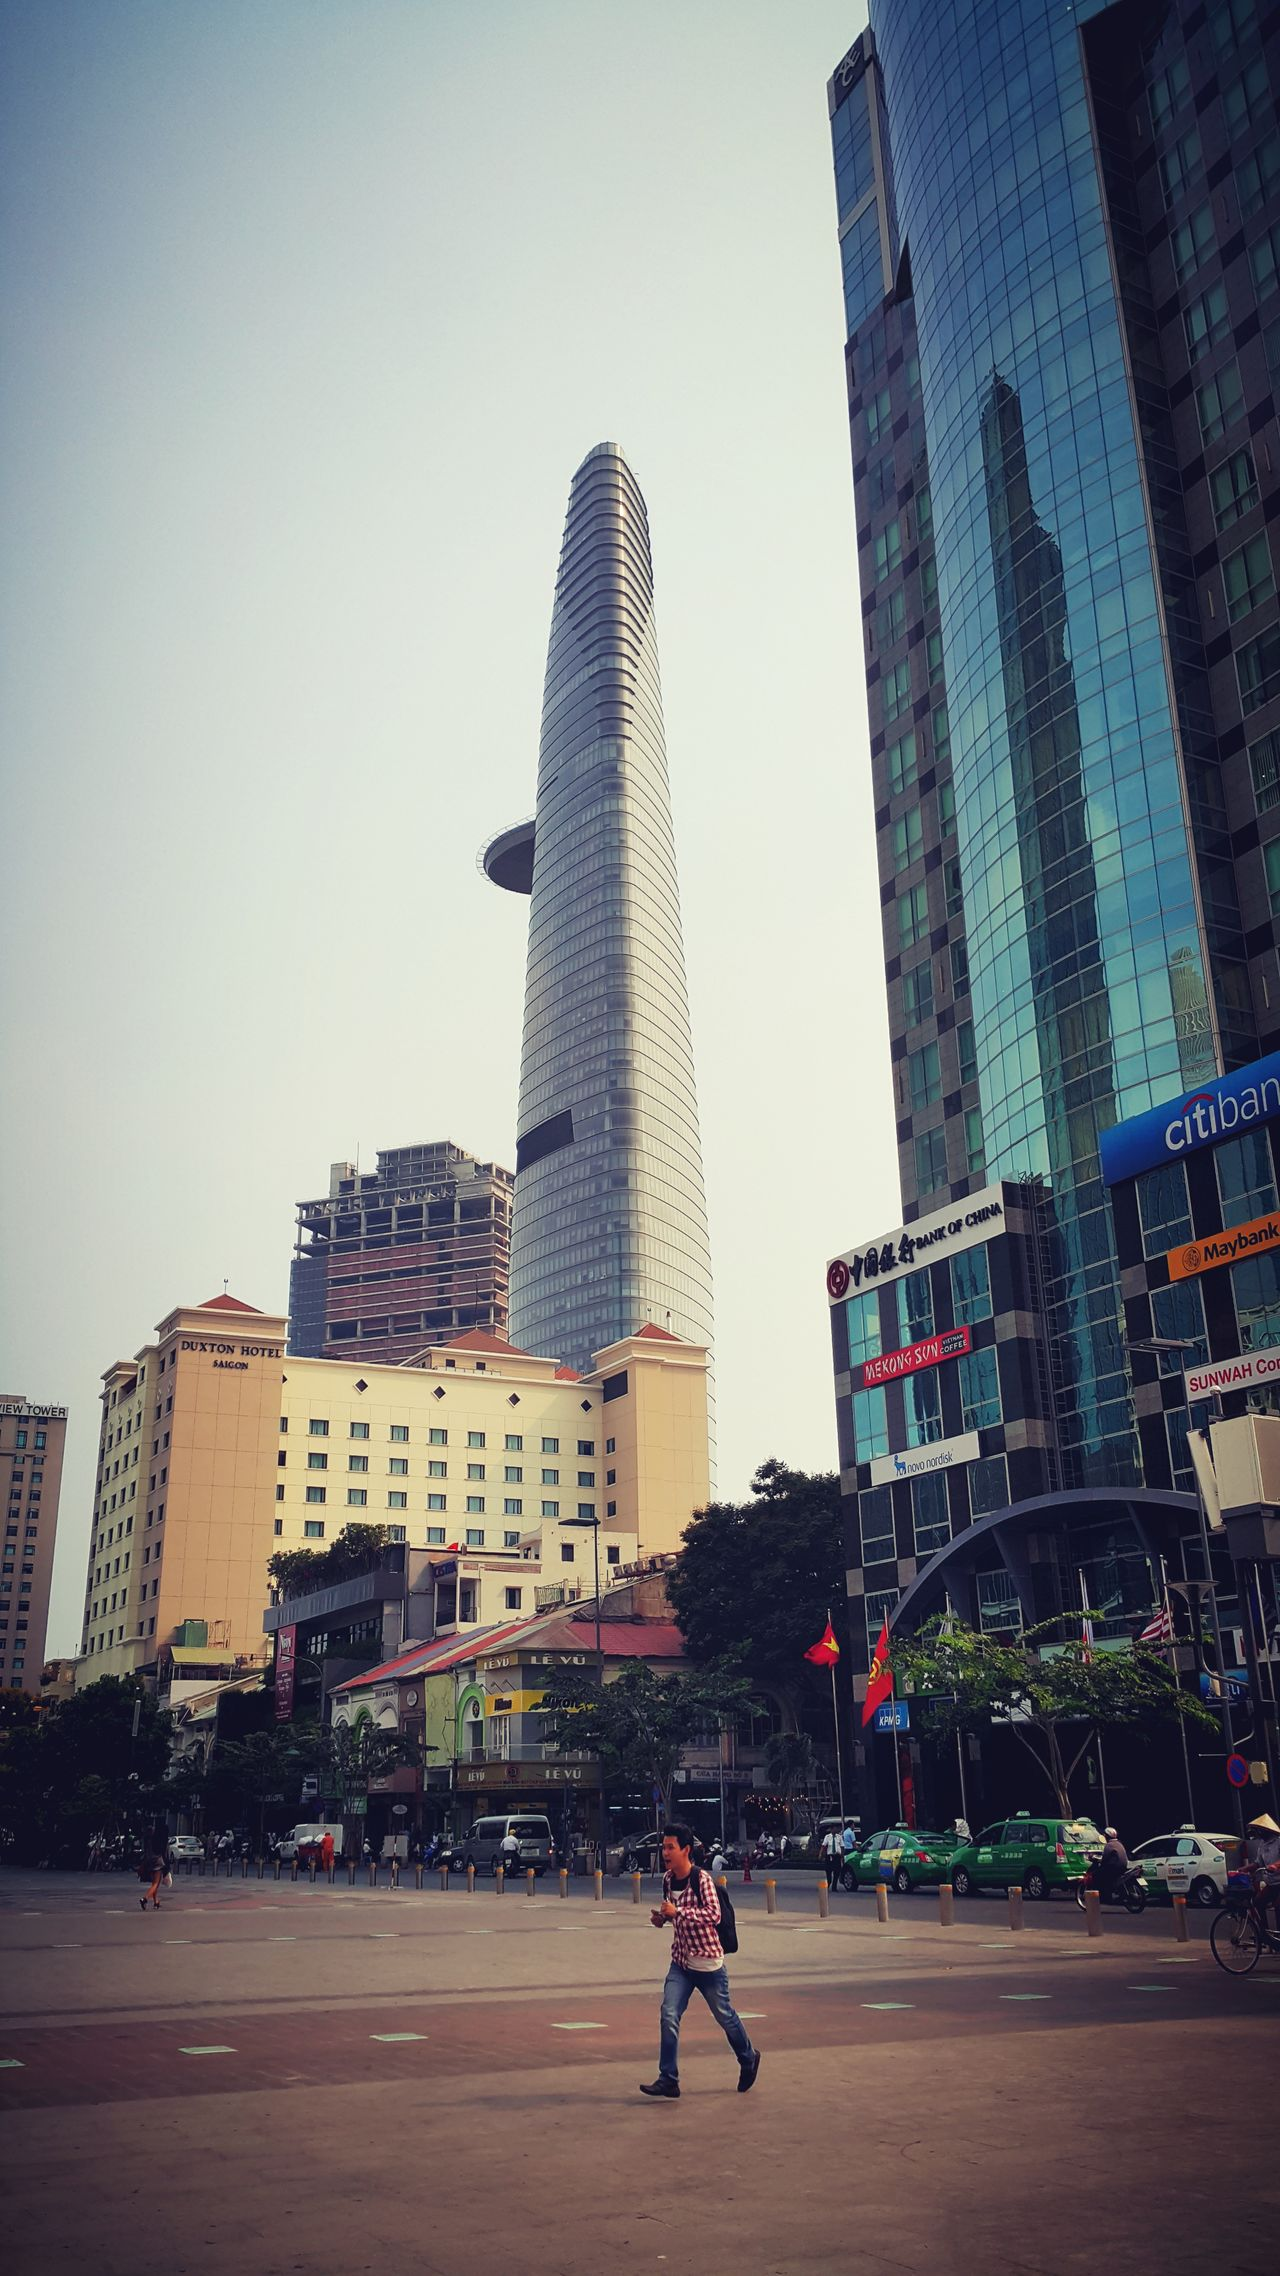 Saigon Day Day In Saigon Beautiful Bitexcofinancialtower NguyenHue Street Taking Photos Hanging Out Nice Day Nice View